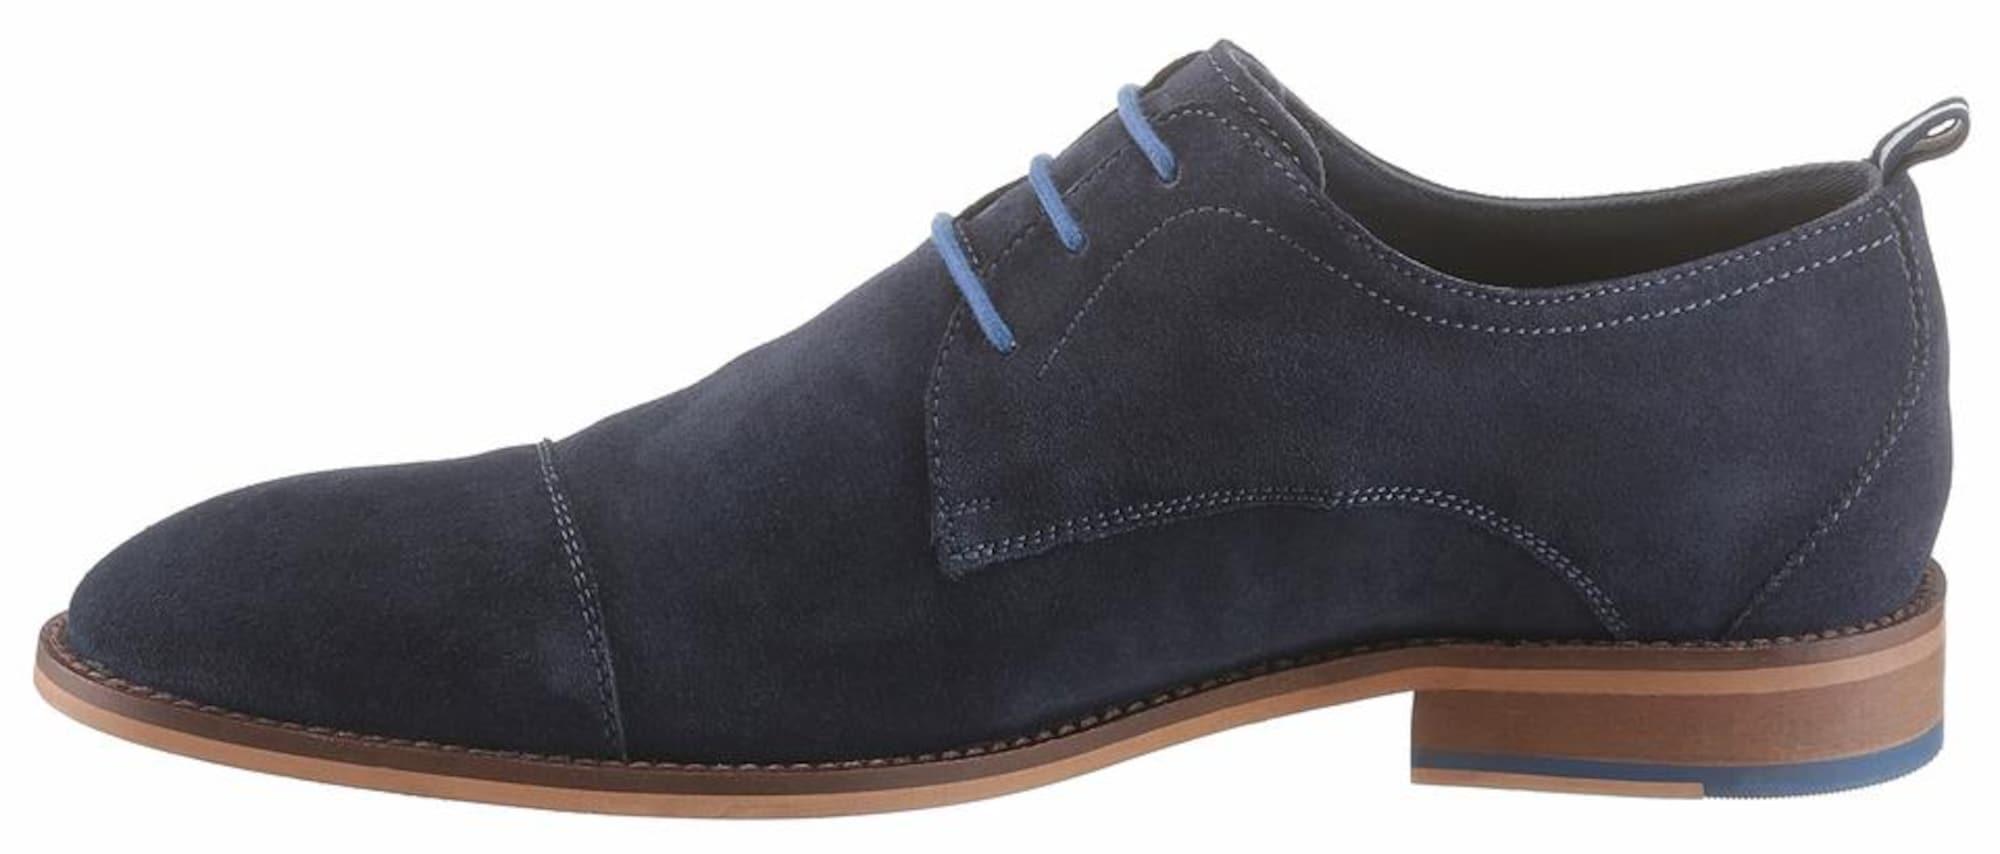 Schnürschuh | Schuhe > Schnürschuhe | PETROLIO